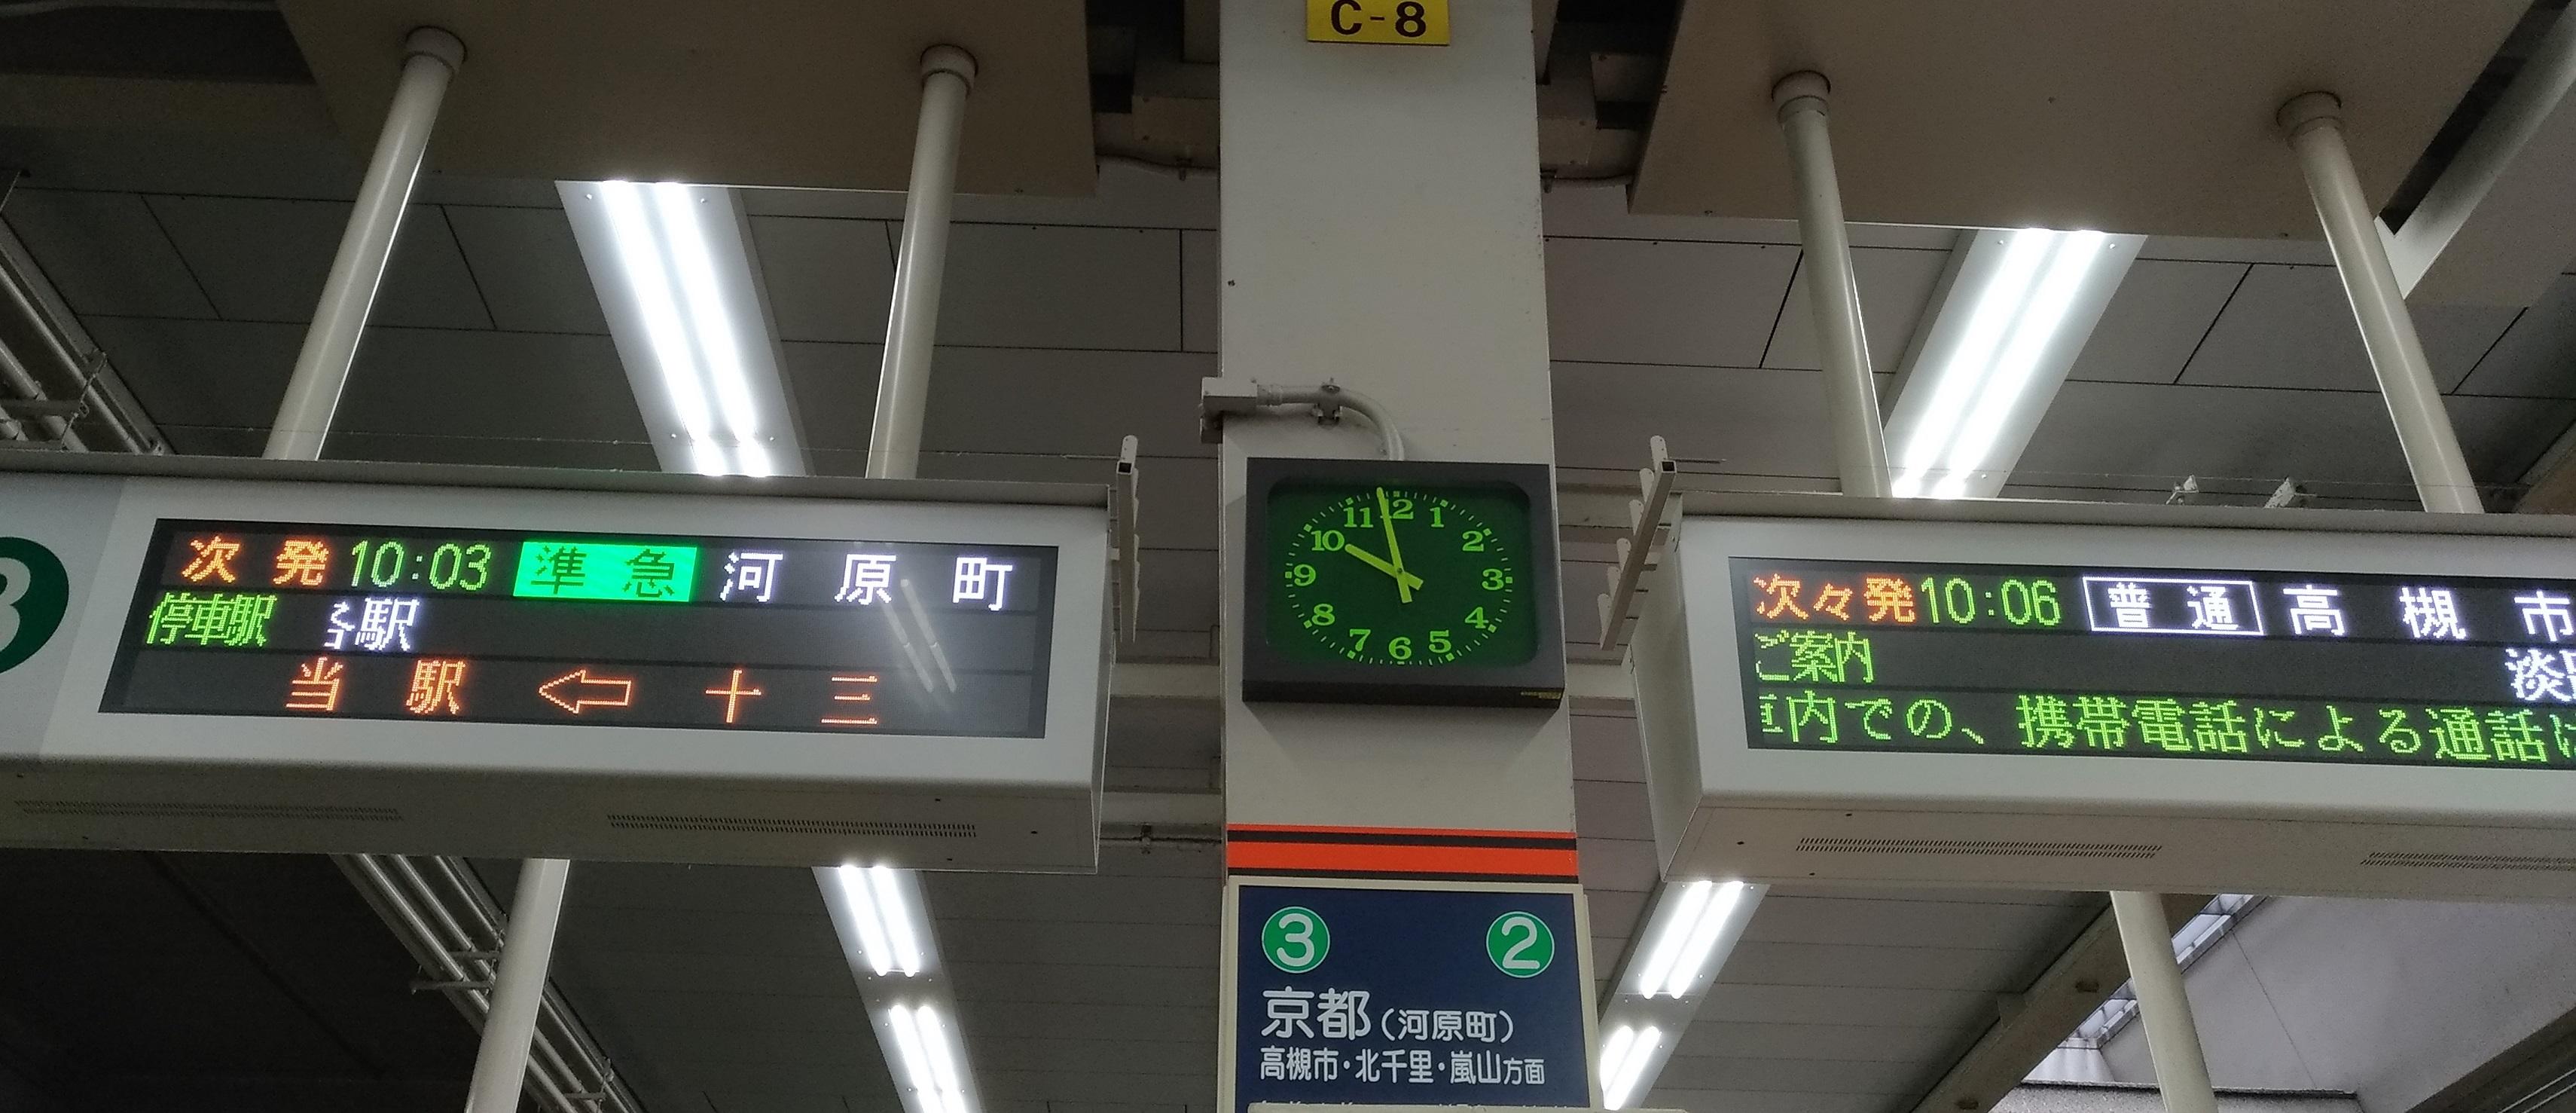 hankyu_osaka_umeda_kyoto_1.jpg